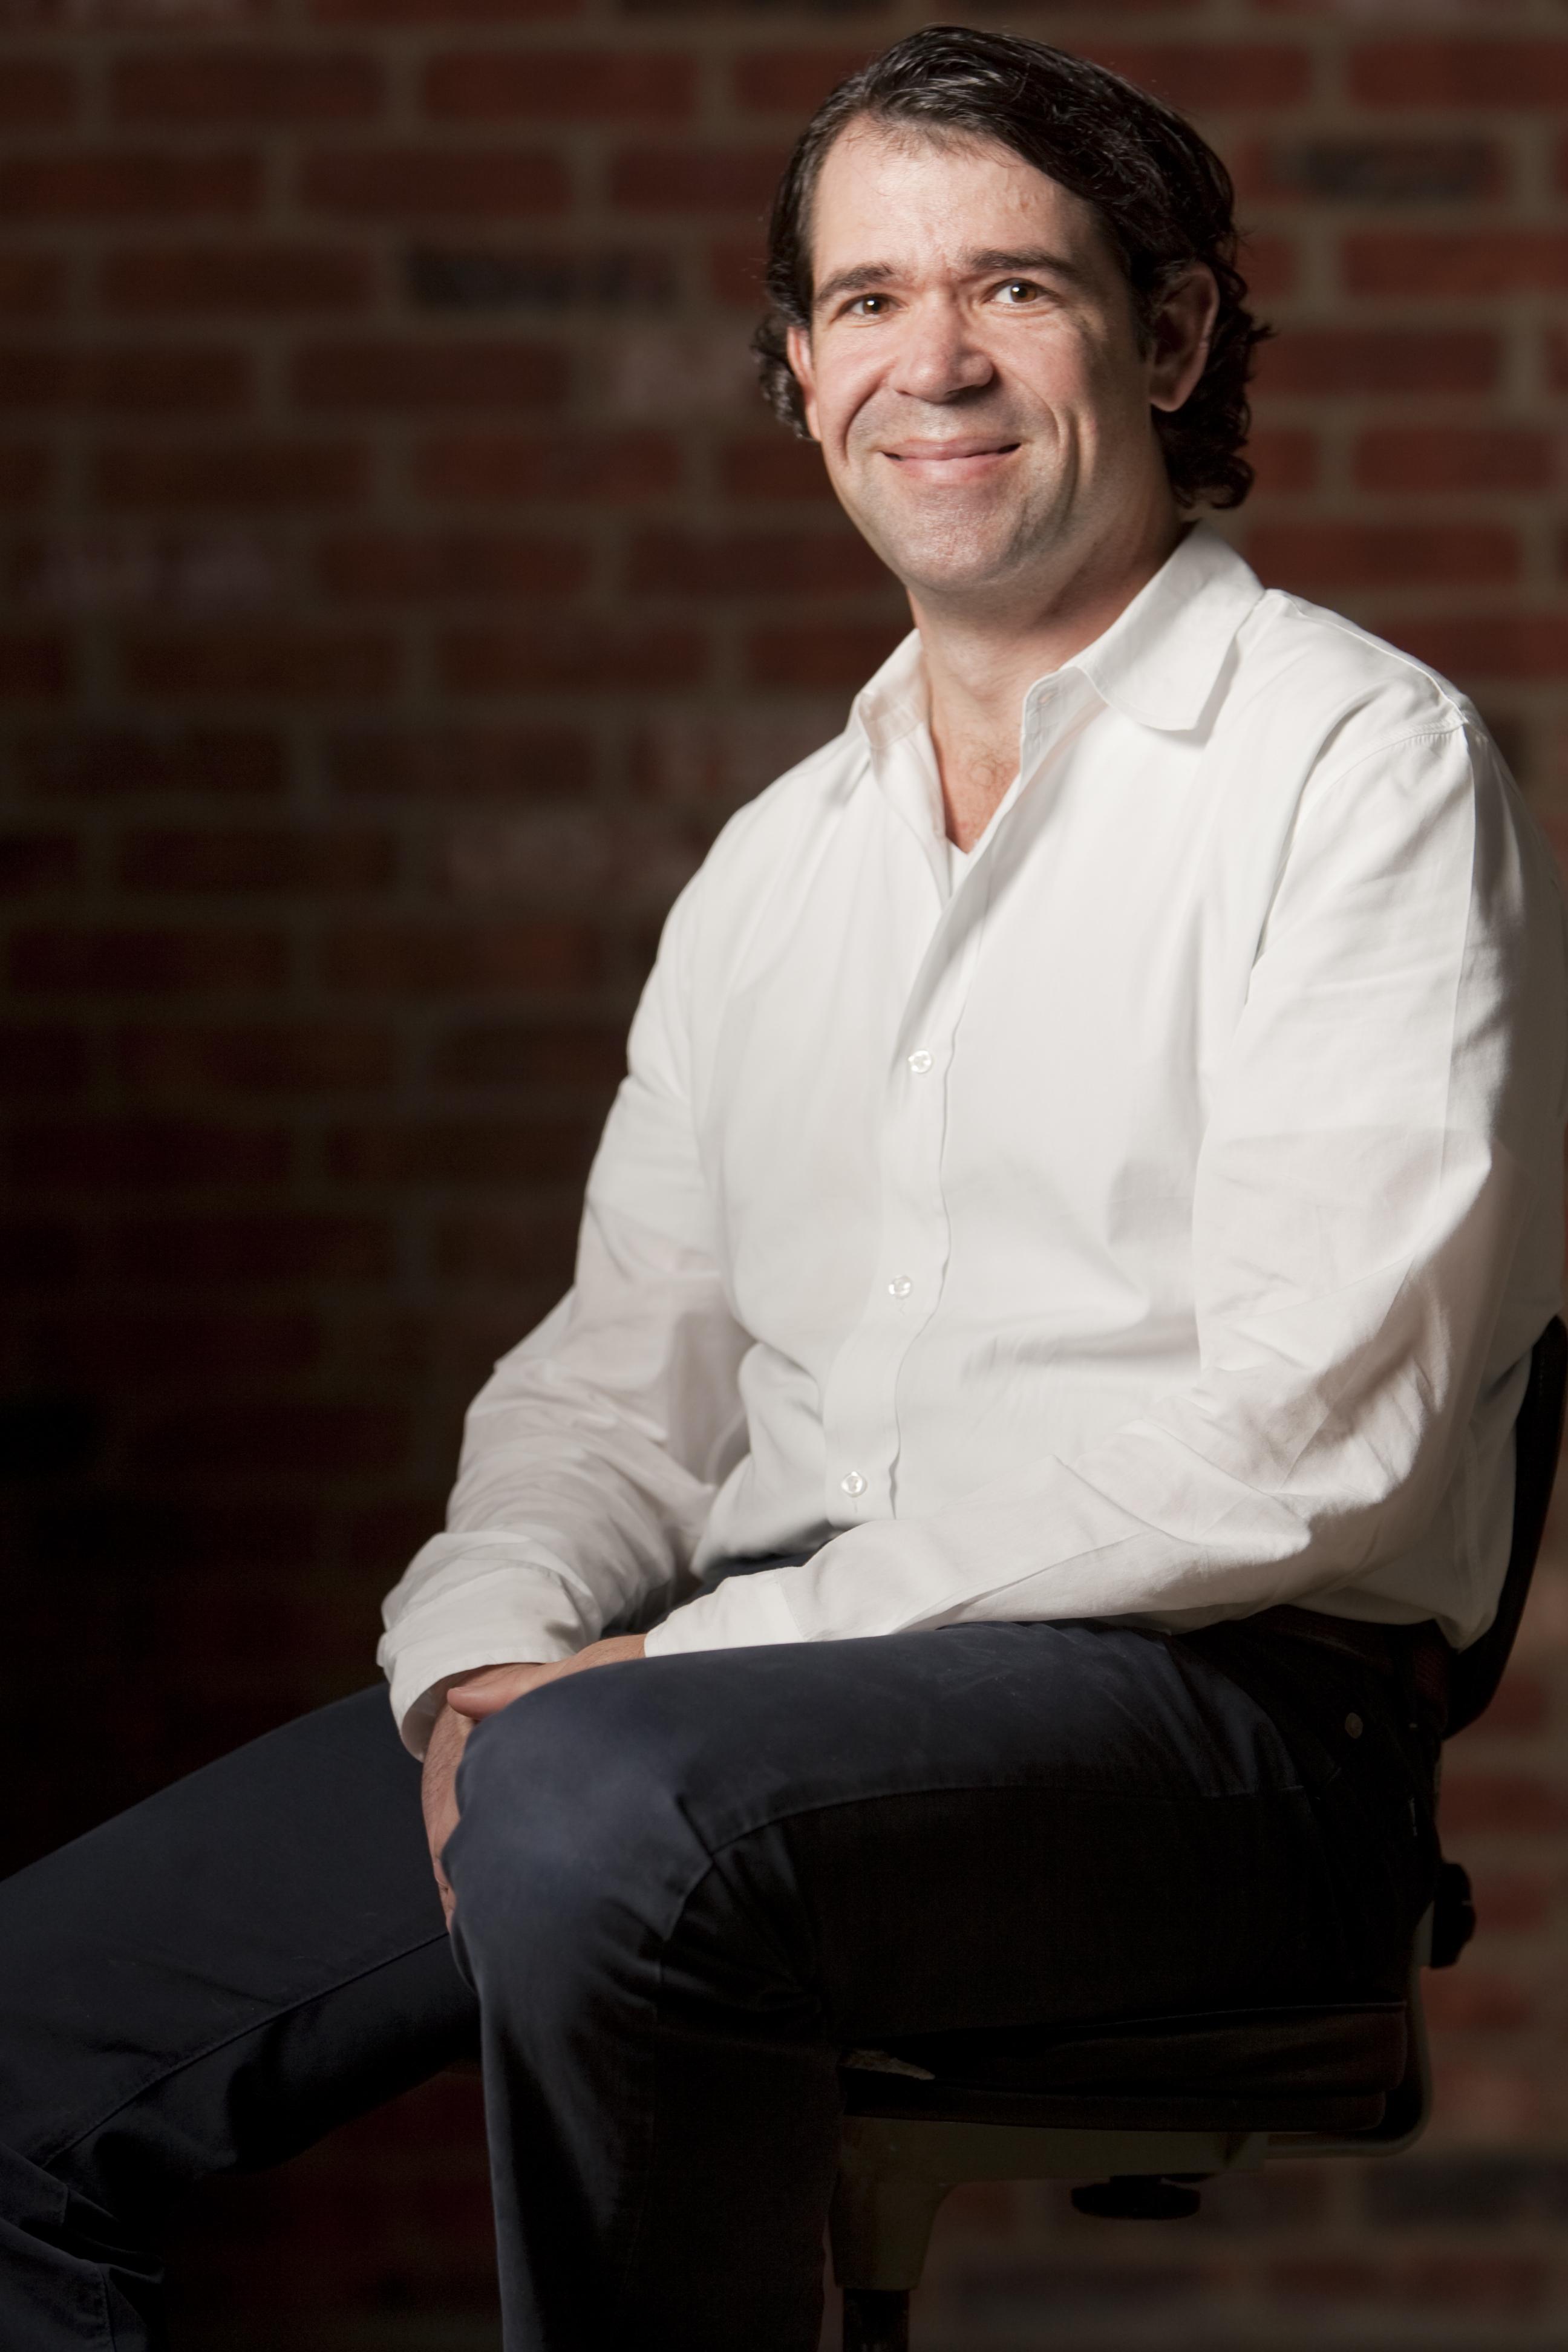 Sonny Bryan's CEO Brent Harman